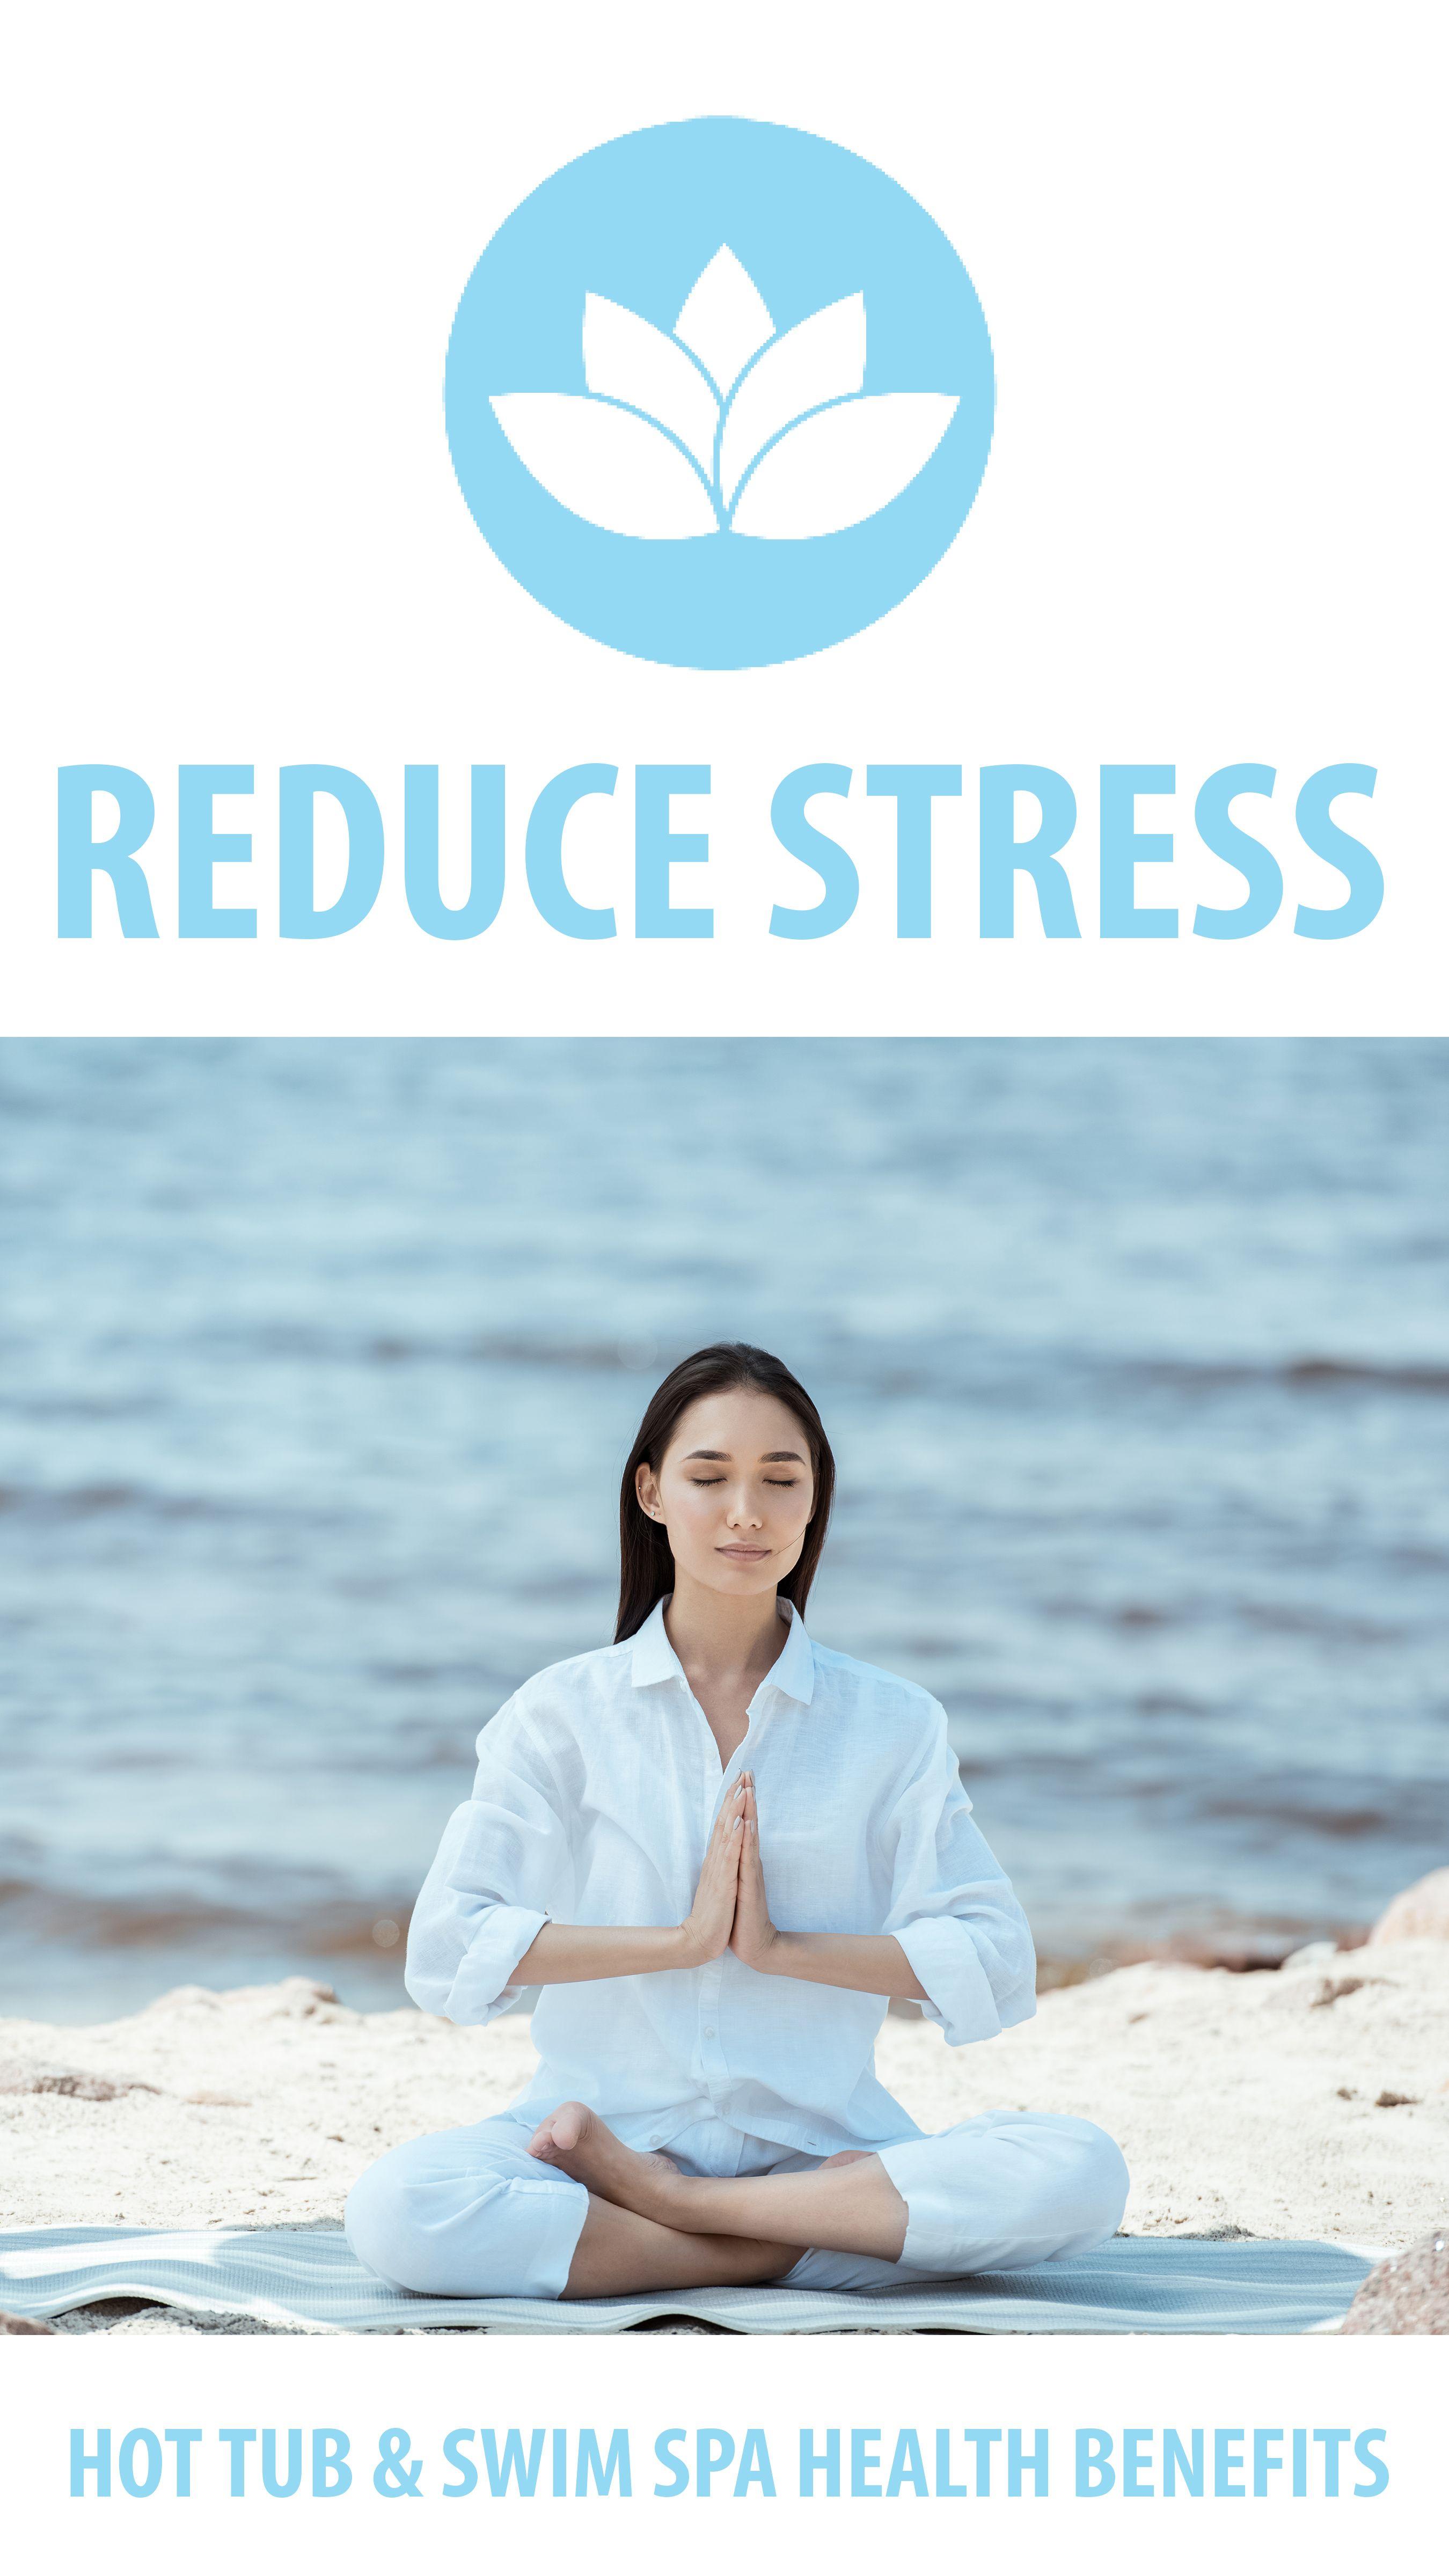 Coastspas hottubs swimspas reducestress stress hot